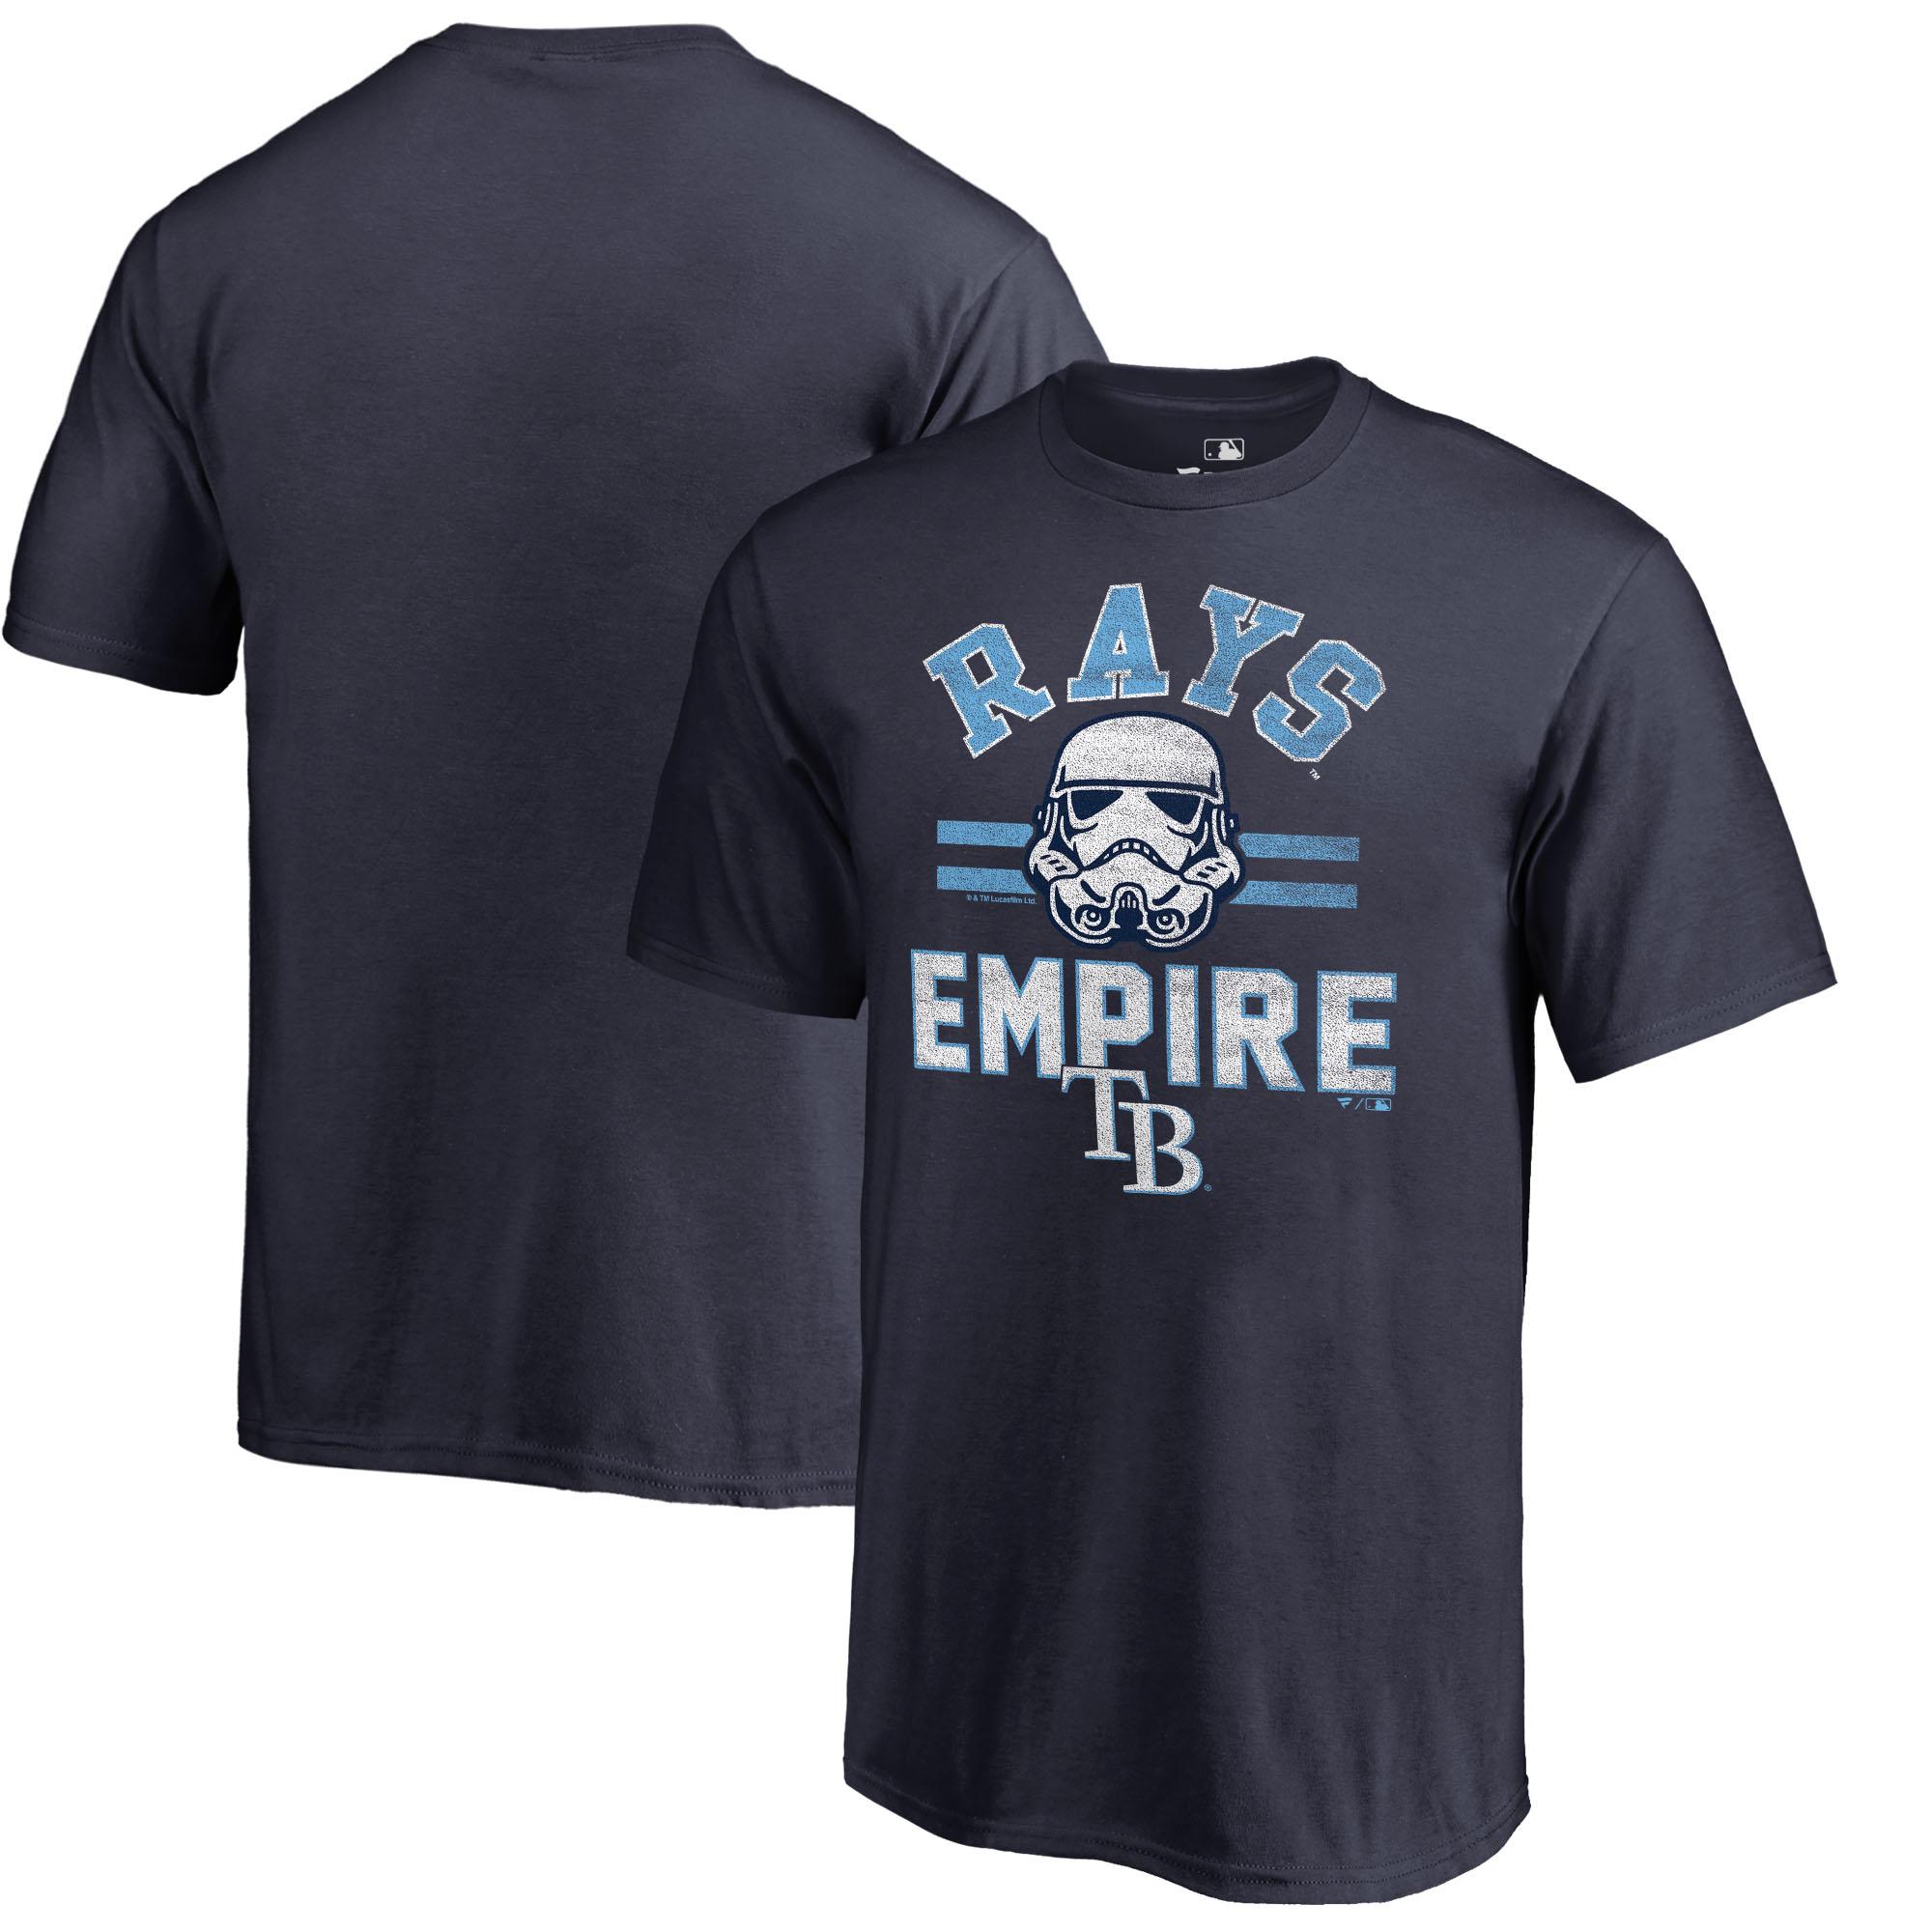 Tampa Bay Rays Fanatics Branded Youth MLB Star Wars Empire T-Shirt - Navy